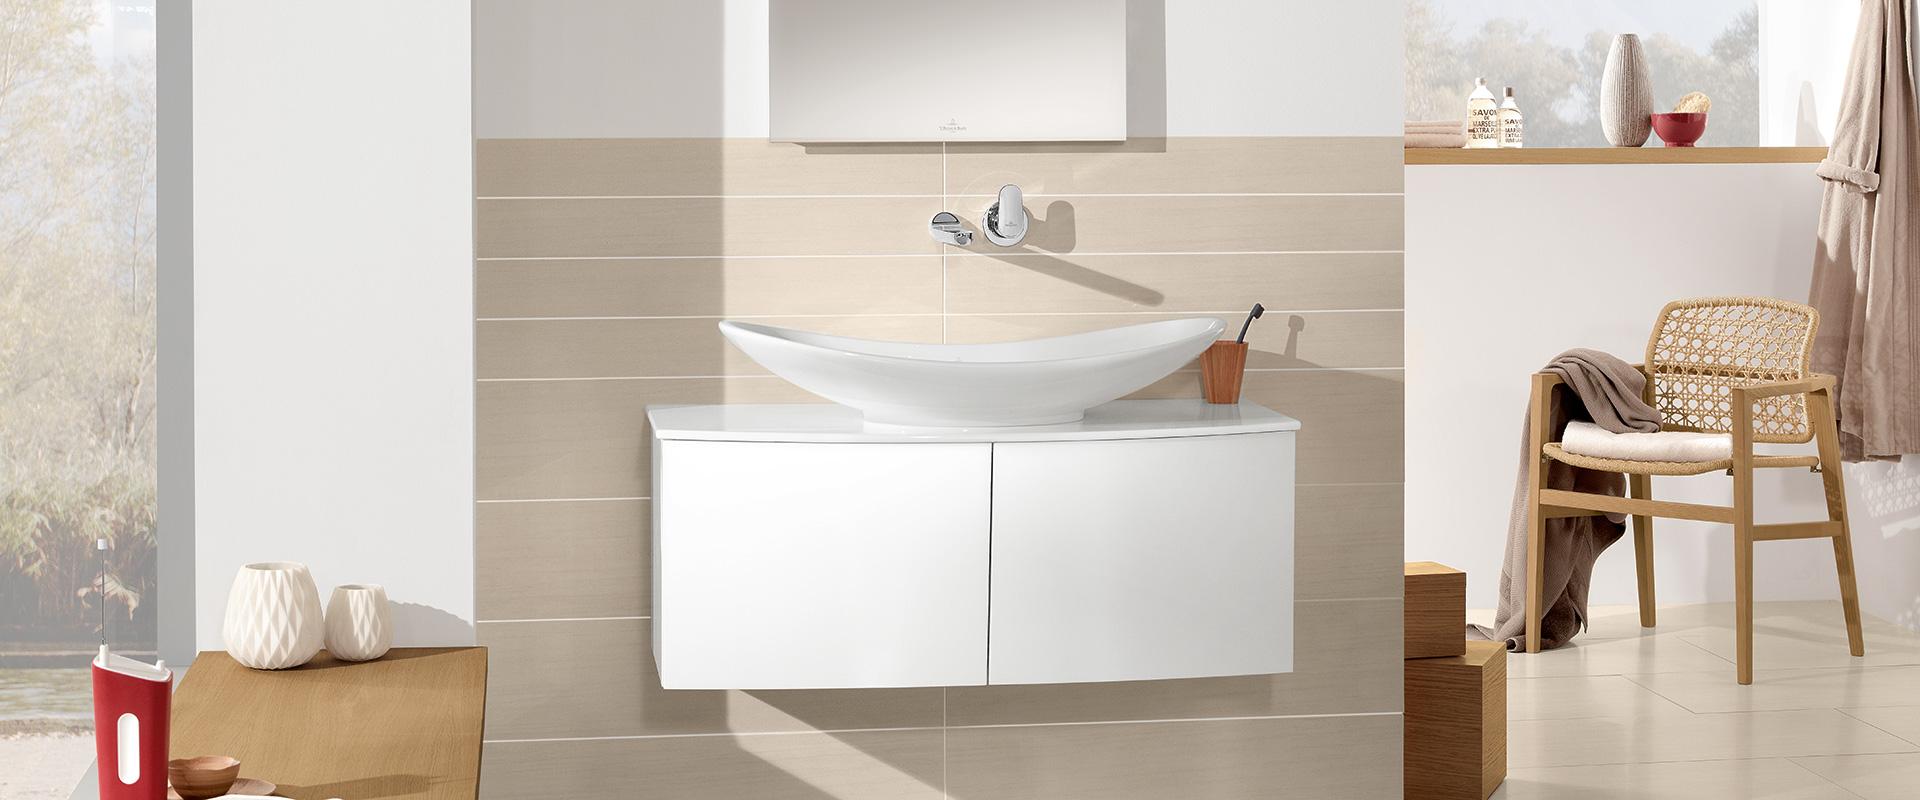 Badezimmermöbel Villeroy Und Boch: Badezimmermbel Holz